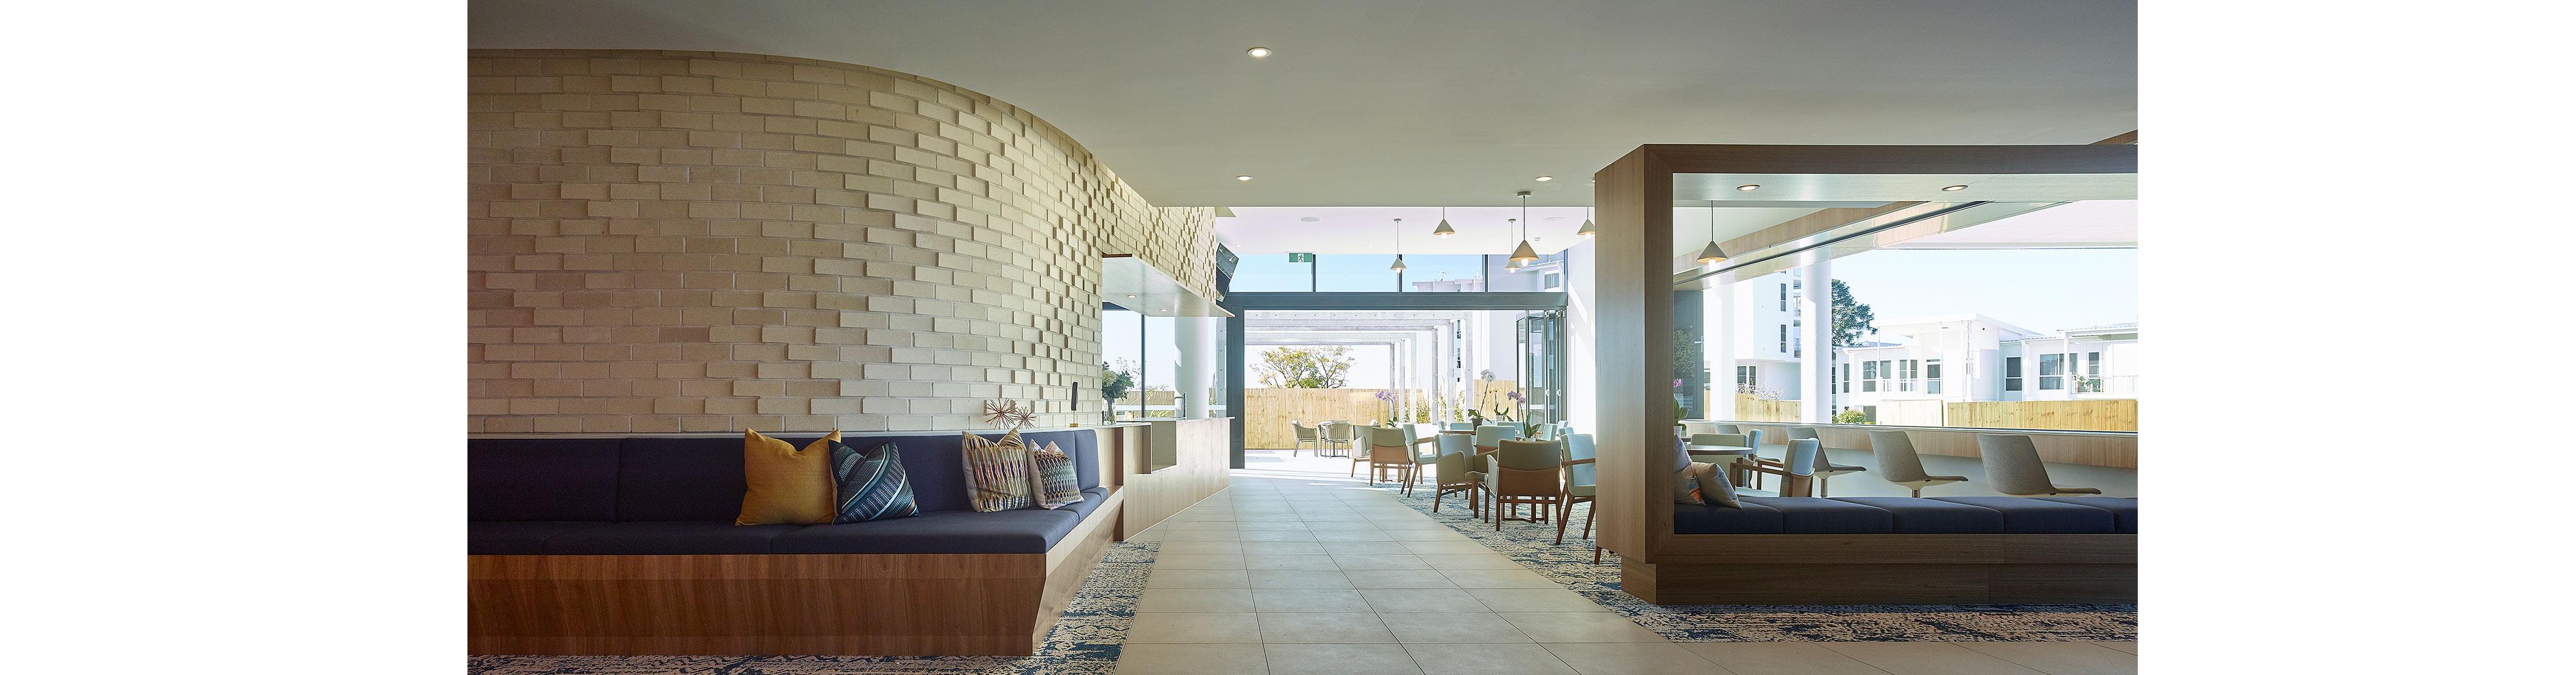 kingsford_terrace_cafe-entrance